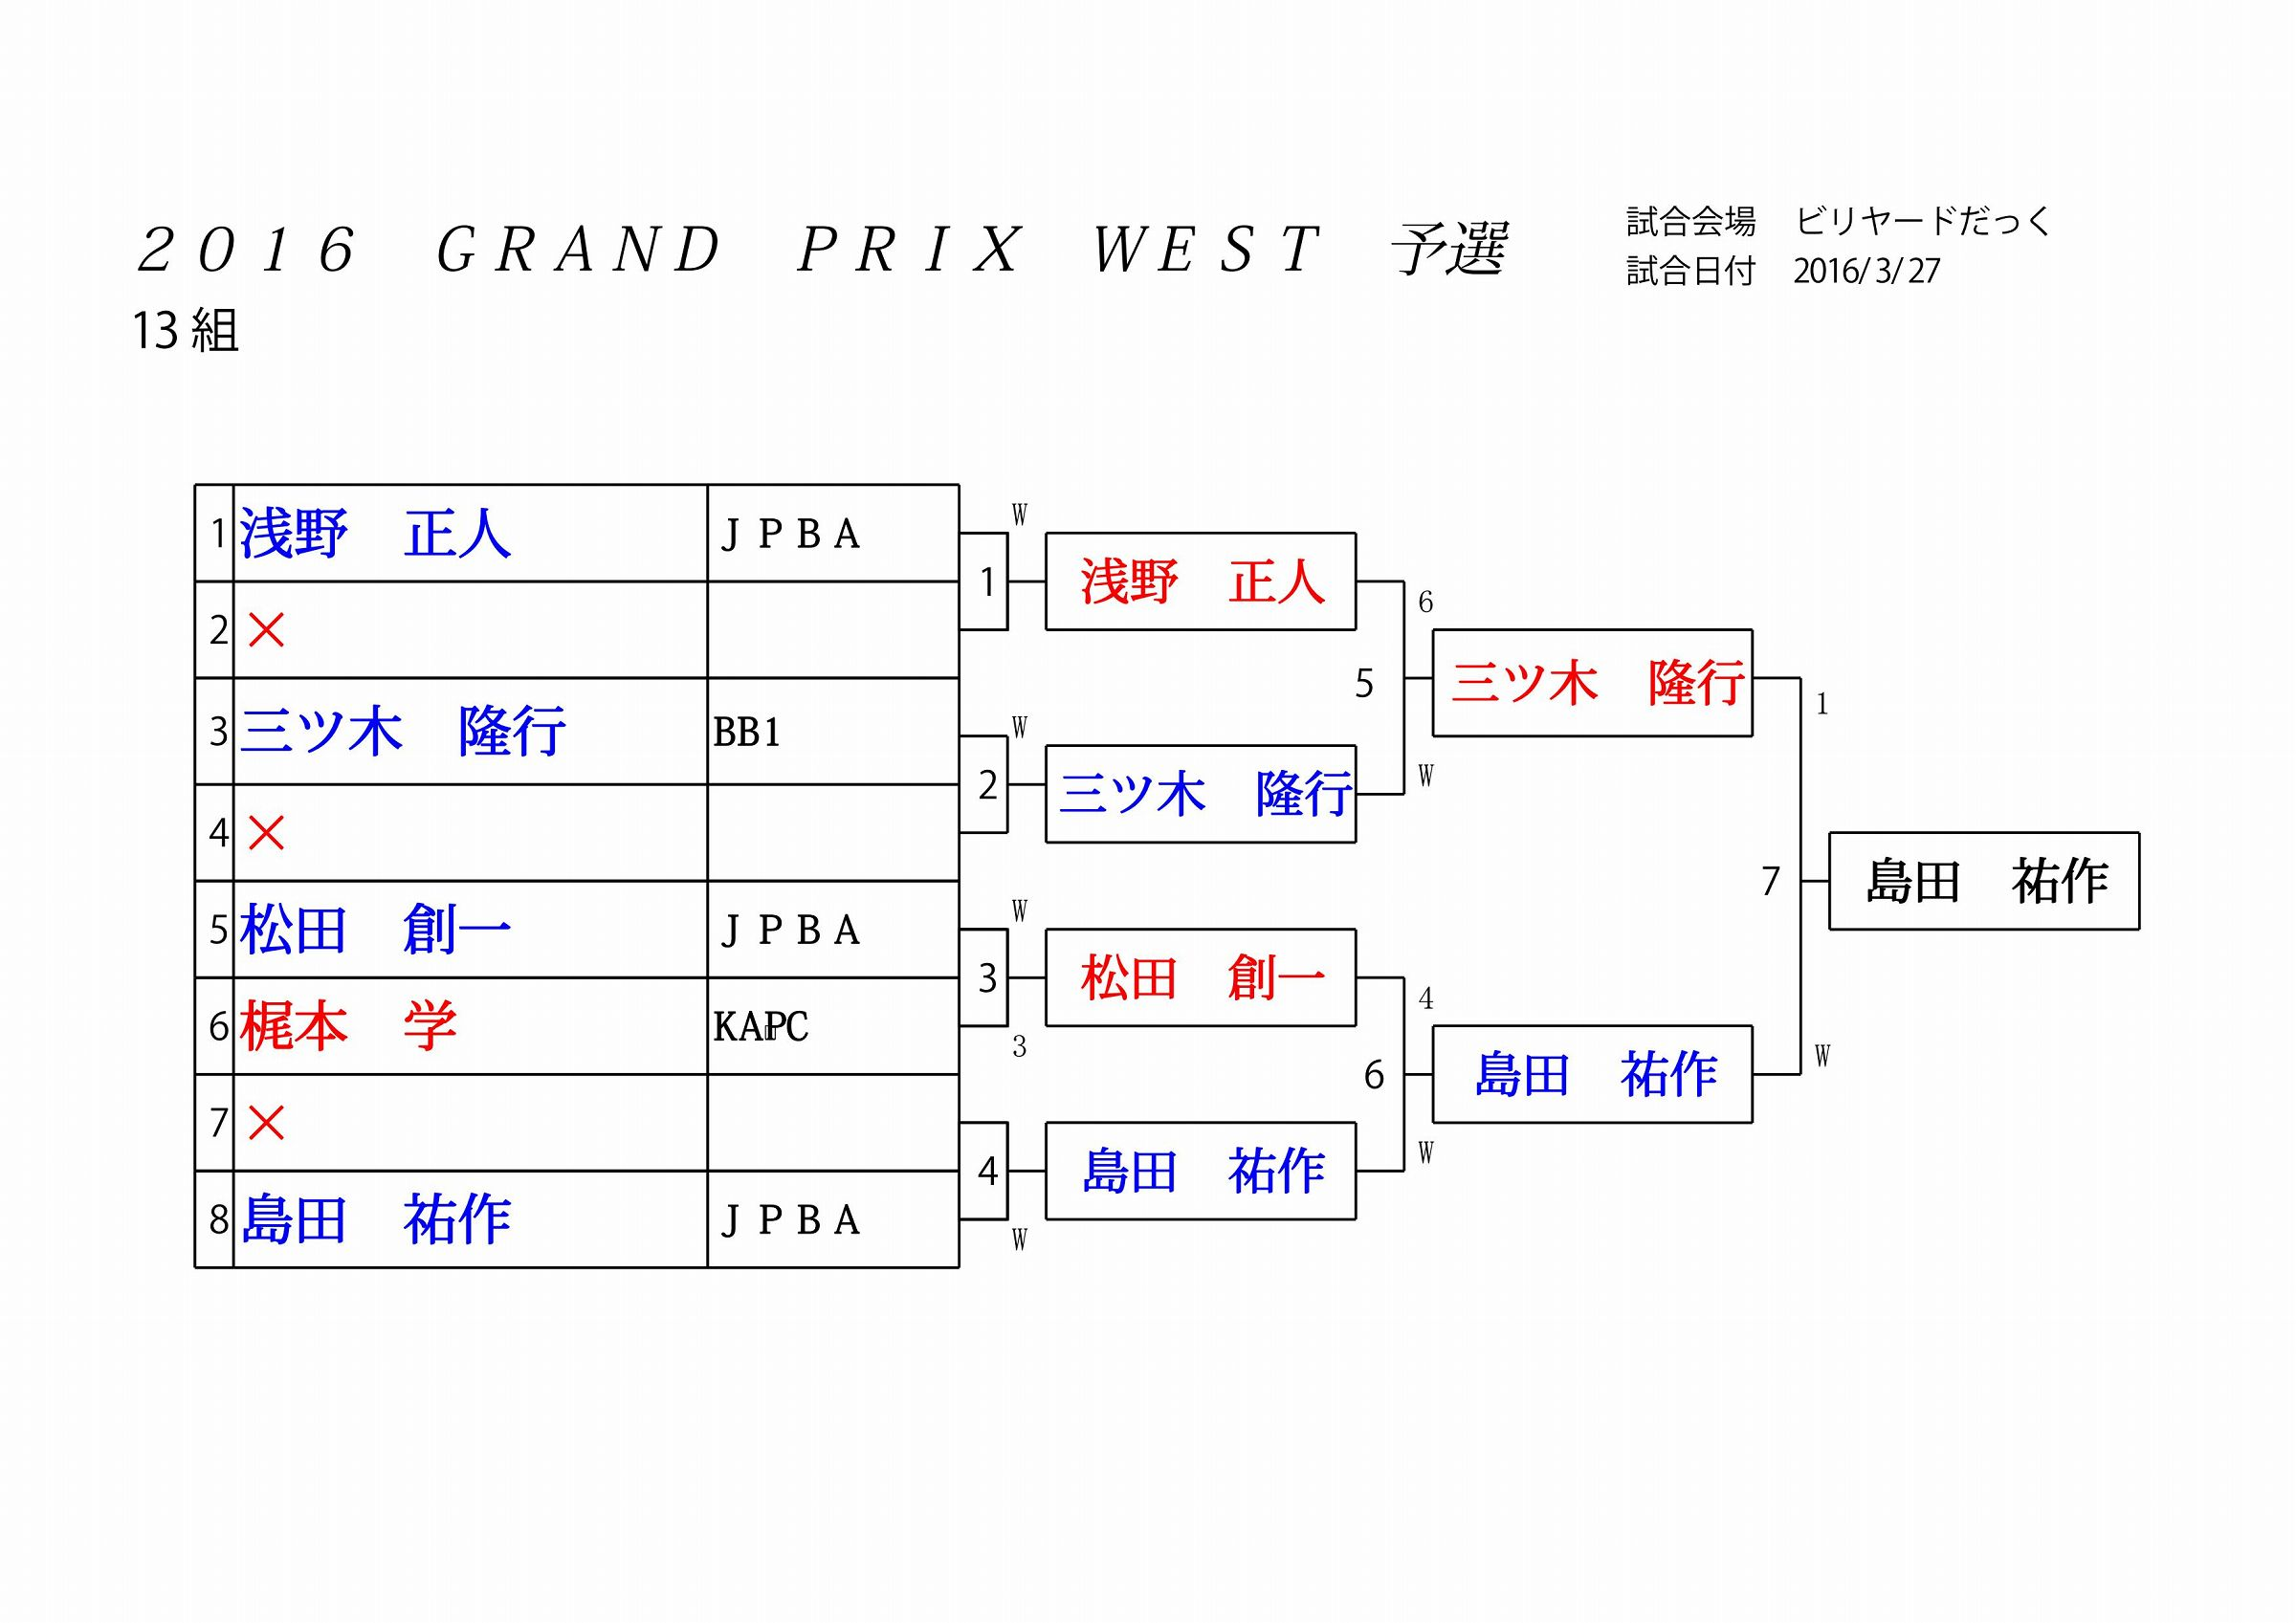 2016 GRAND PRIX WEST 予選_13